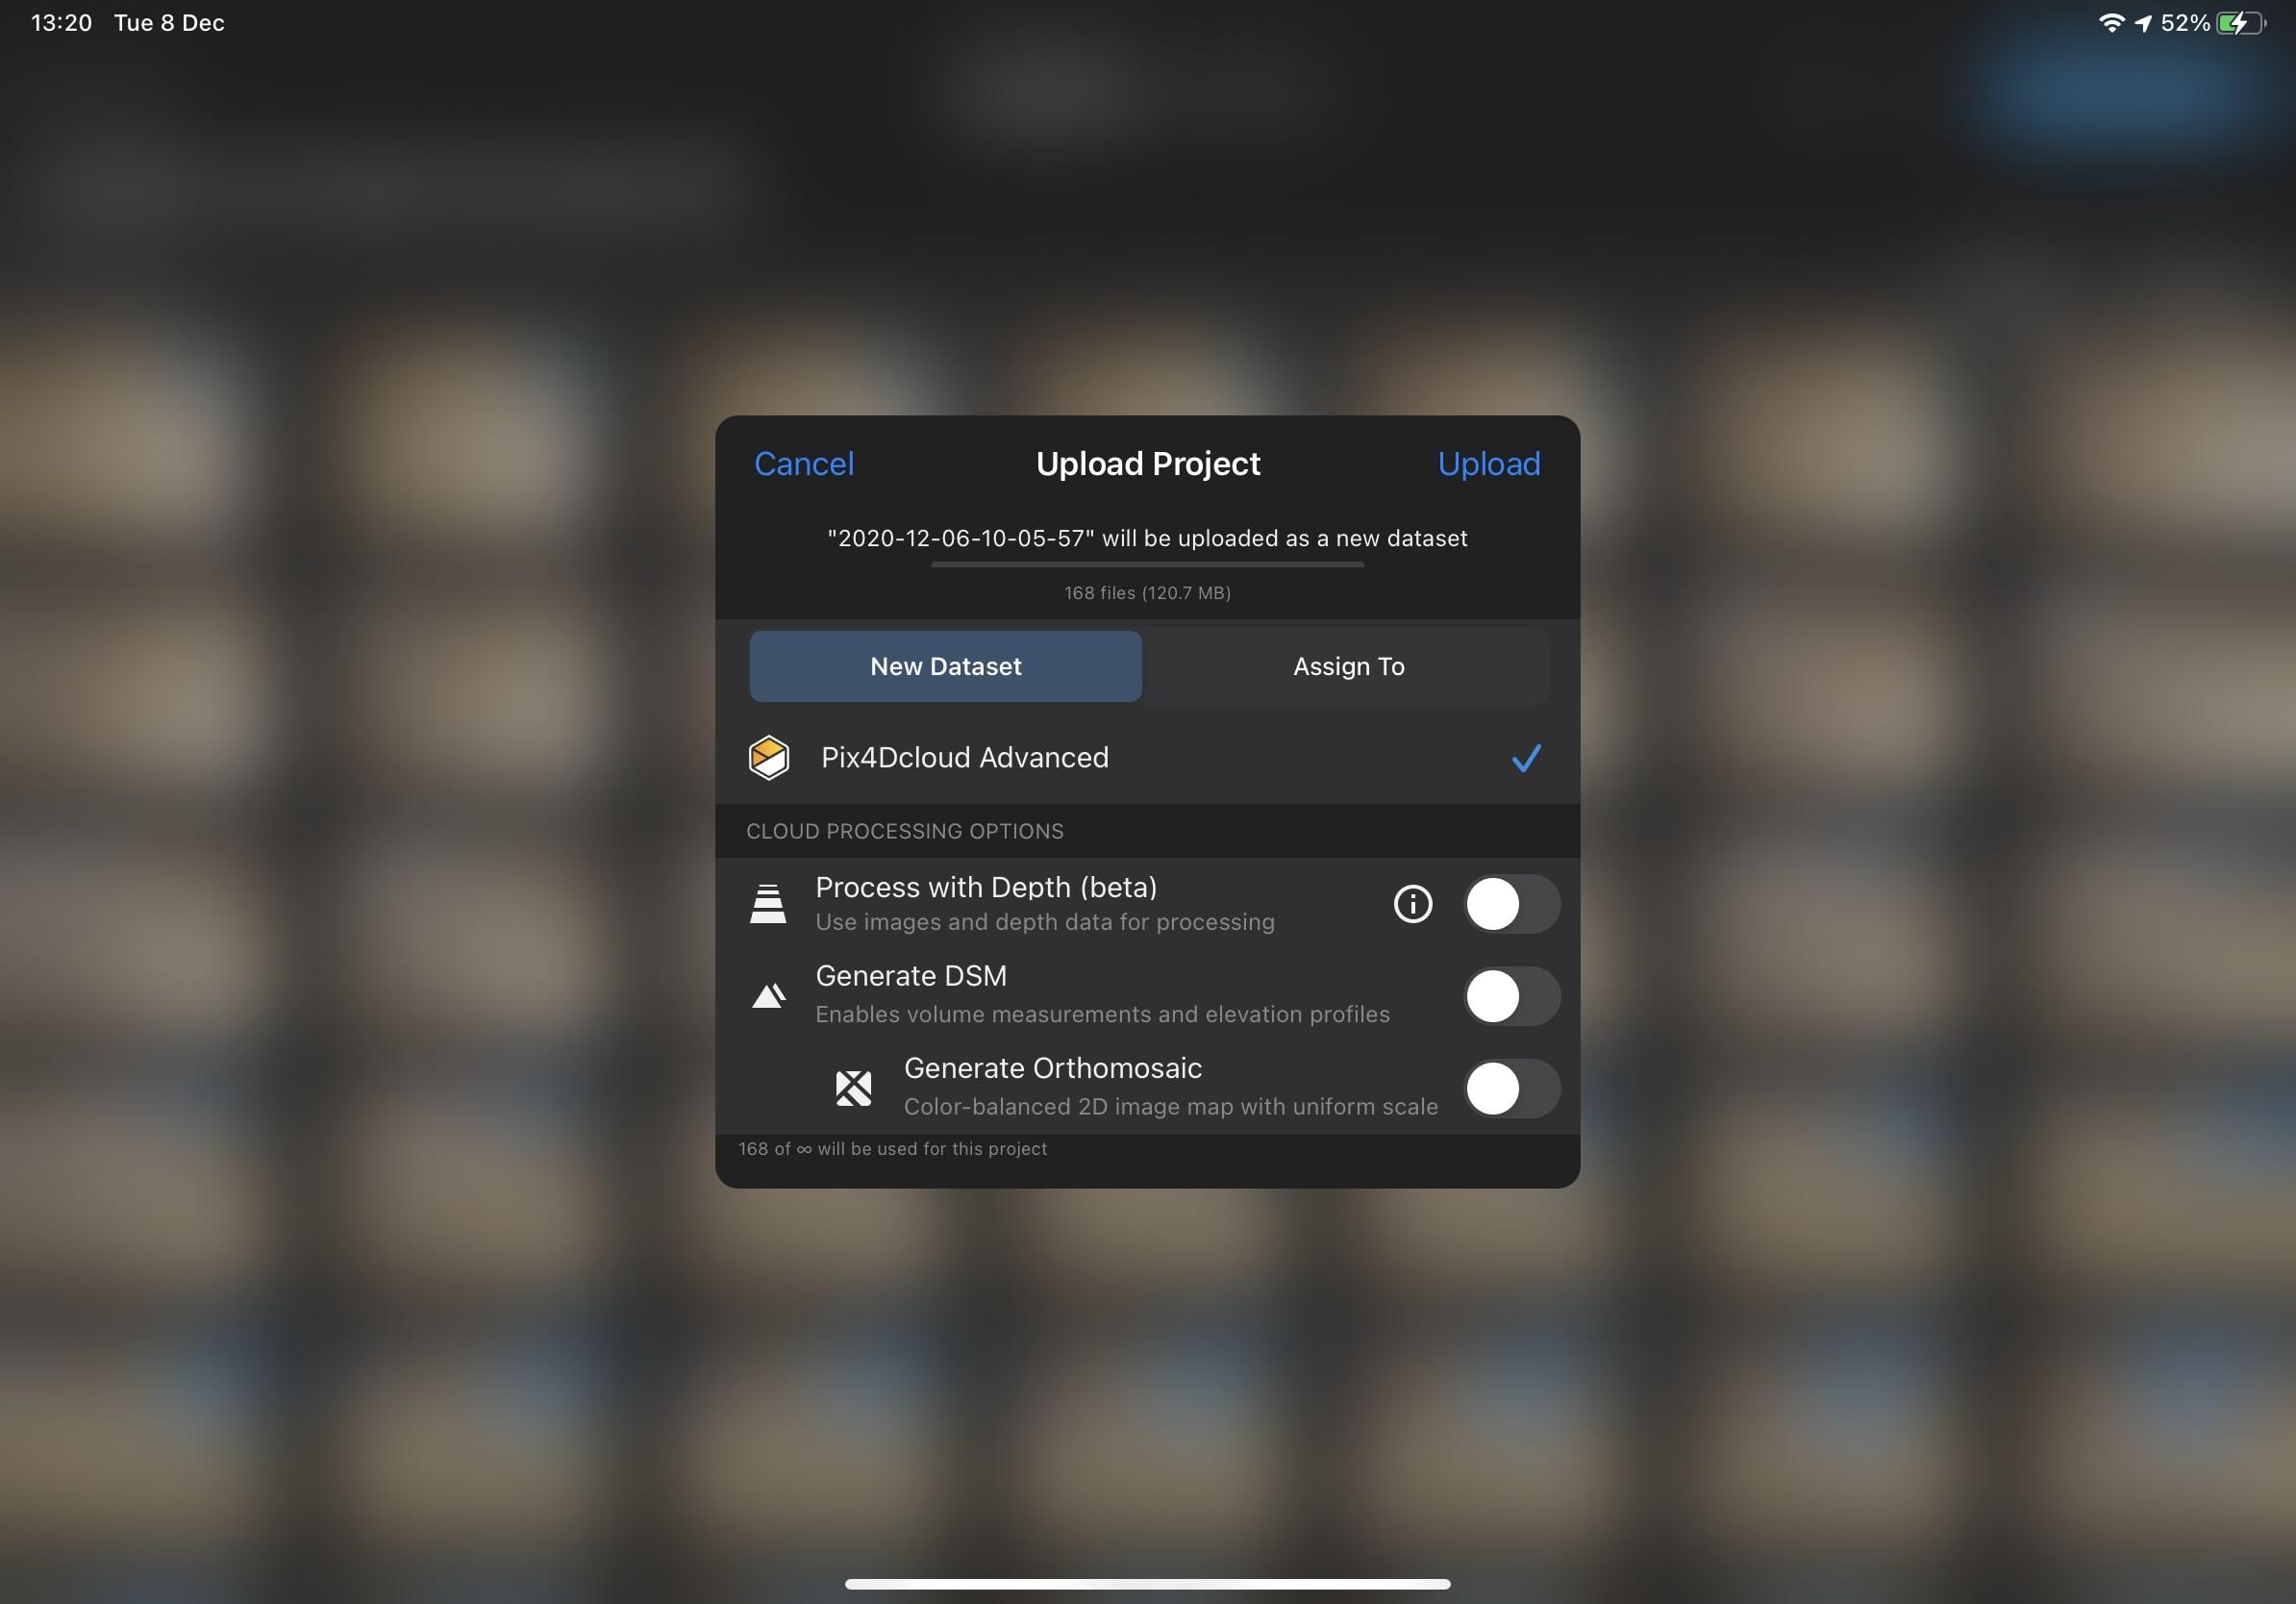 Pix4Dcatch interface